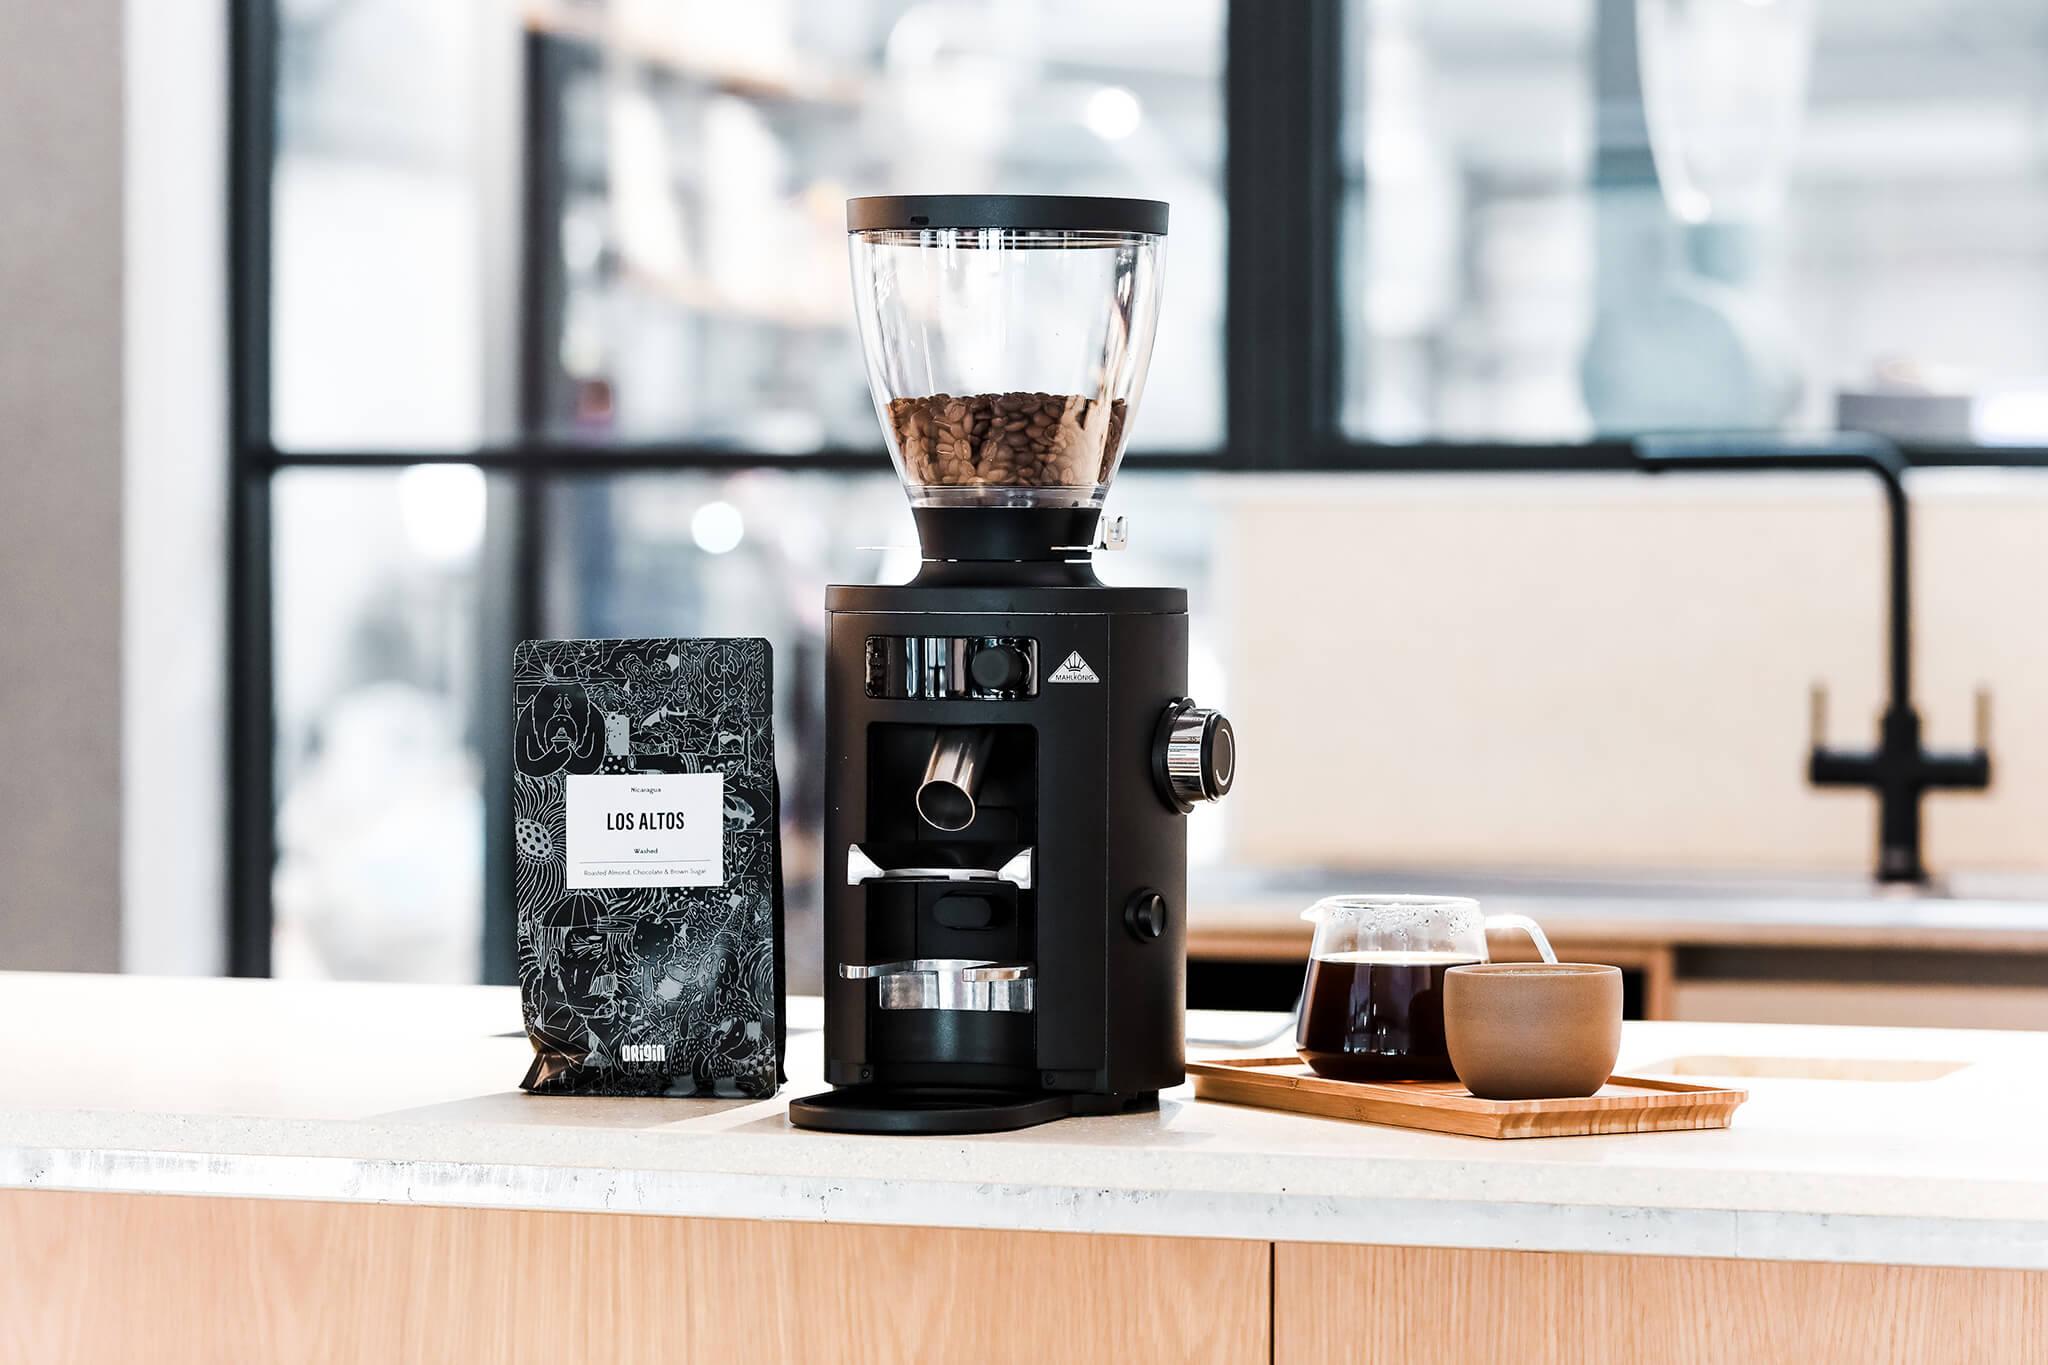 A home coffee grinder sitting on a bar